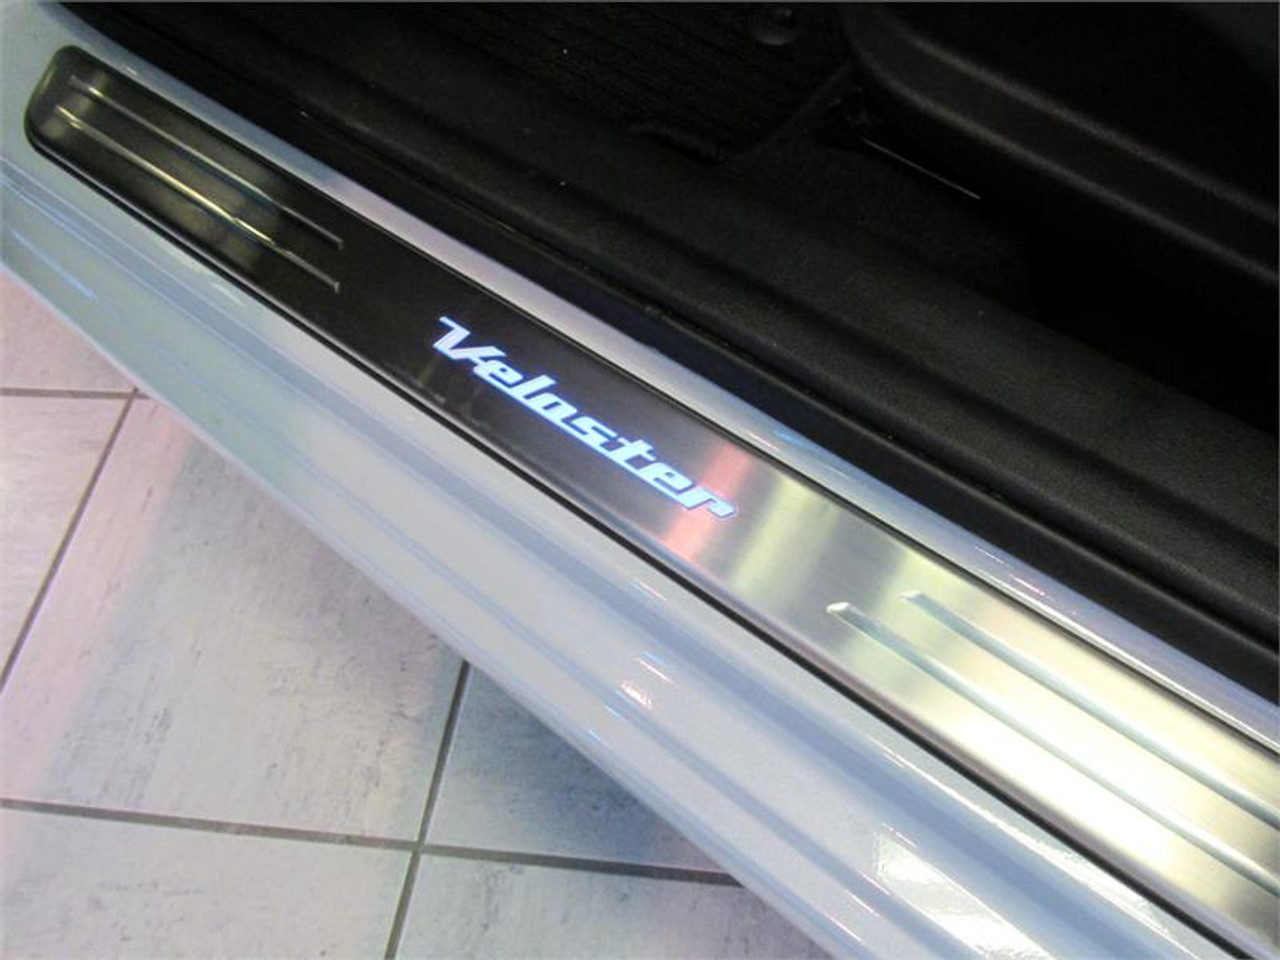 2013 2017 Hyundai Veloster Led Door Sill Plates Free